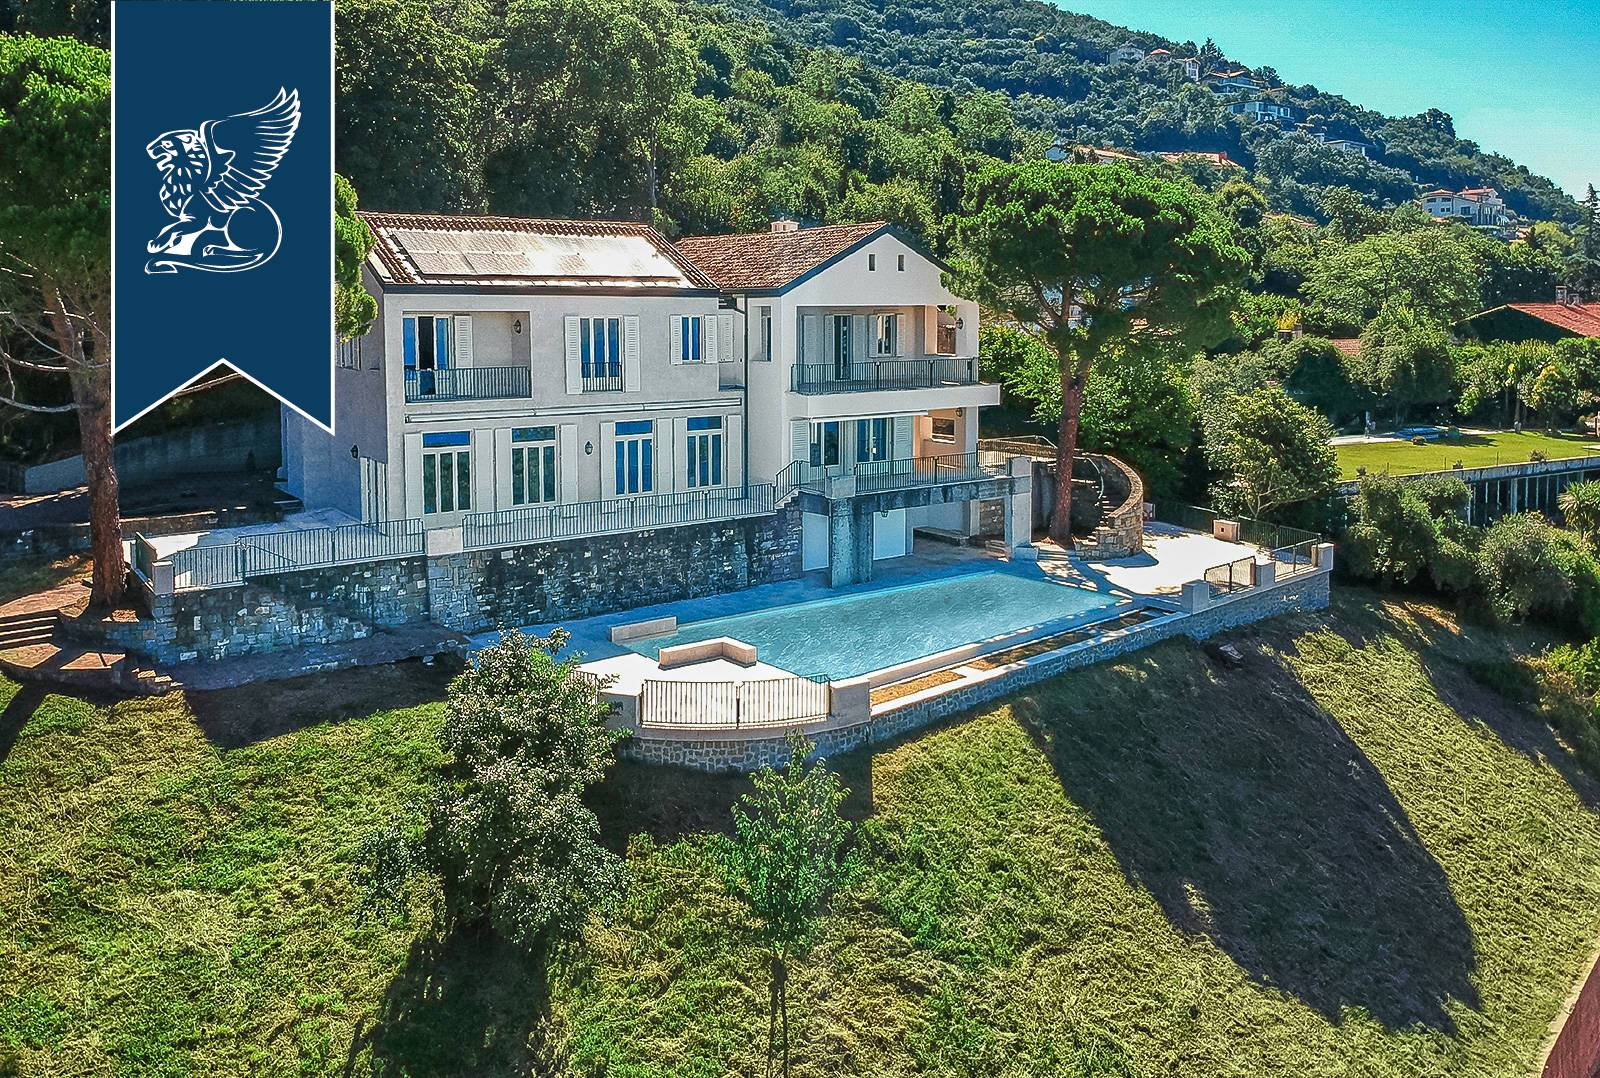 Villa in Vendita a Trieste: 0 locali, 900 mq - Foto 2